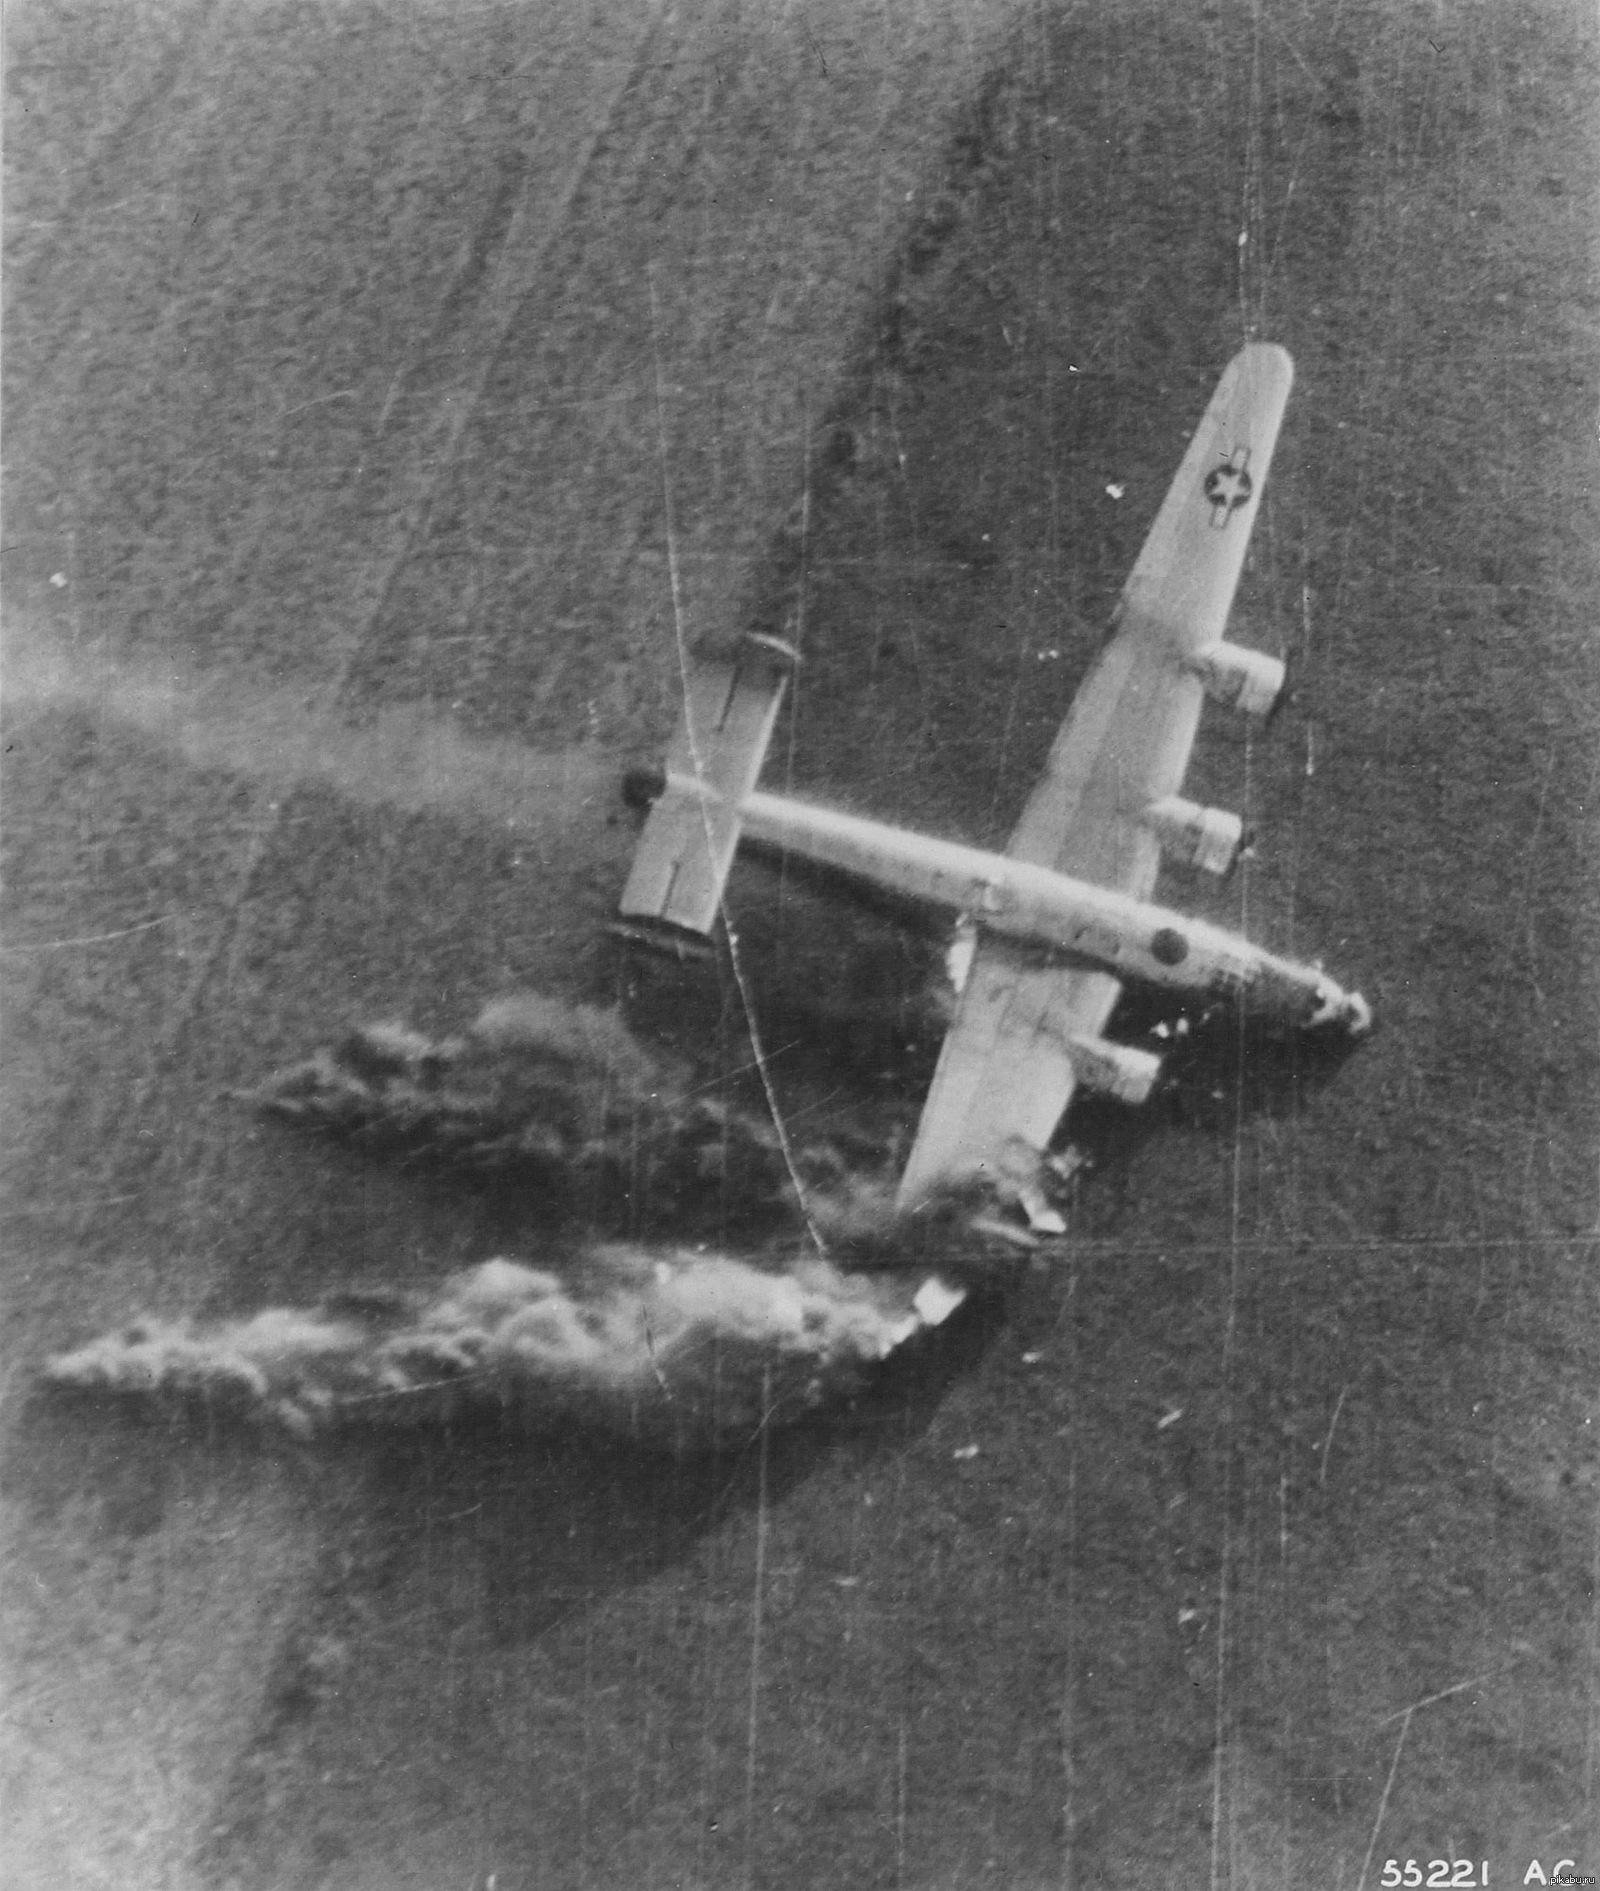 связи сбитый самолет картинки никогда